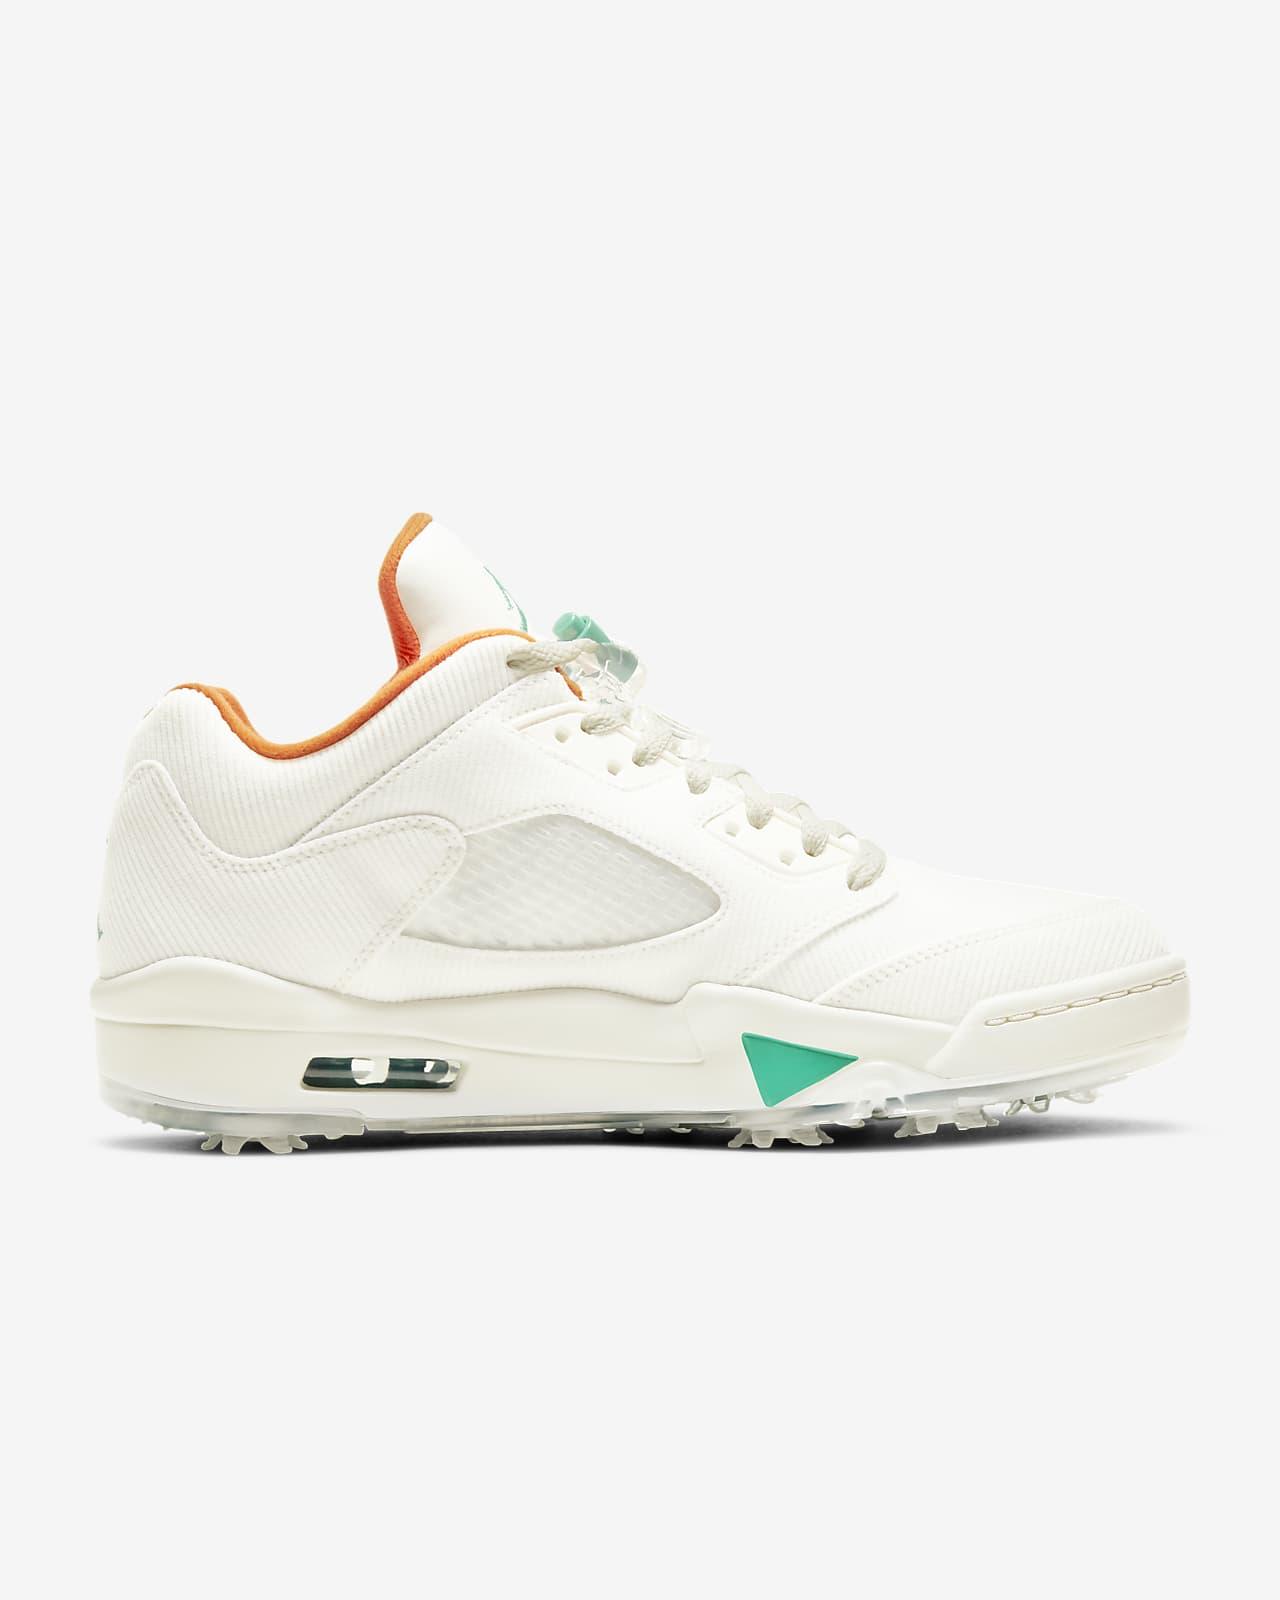 Jordan 5 Low G Golf Shoe. Nike SA